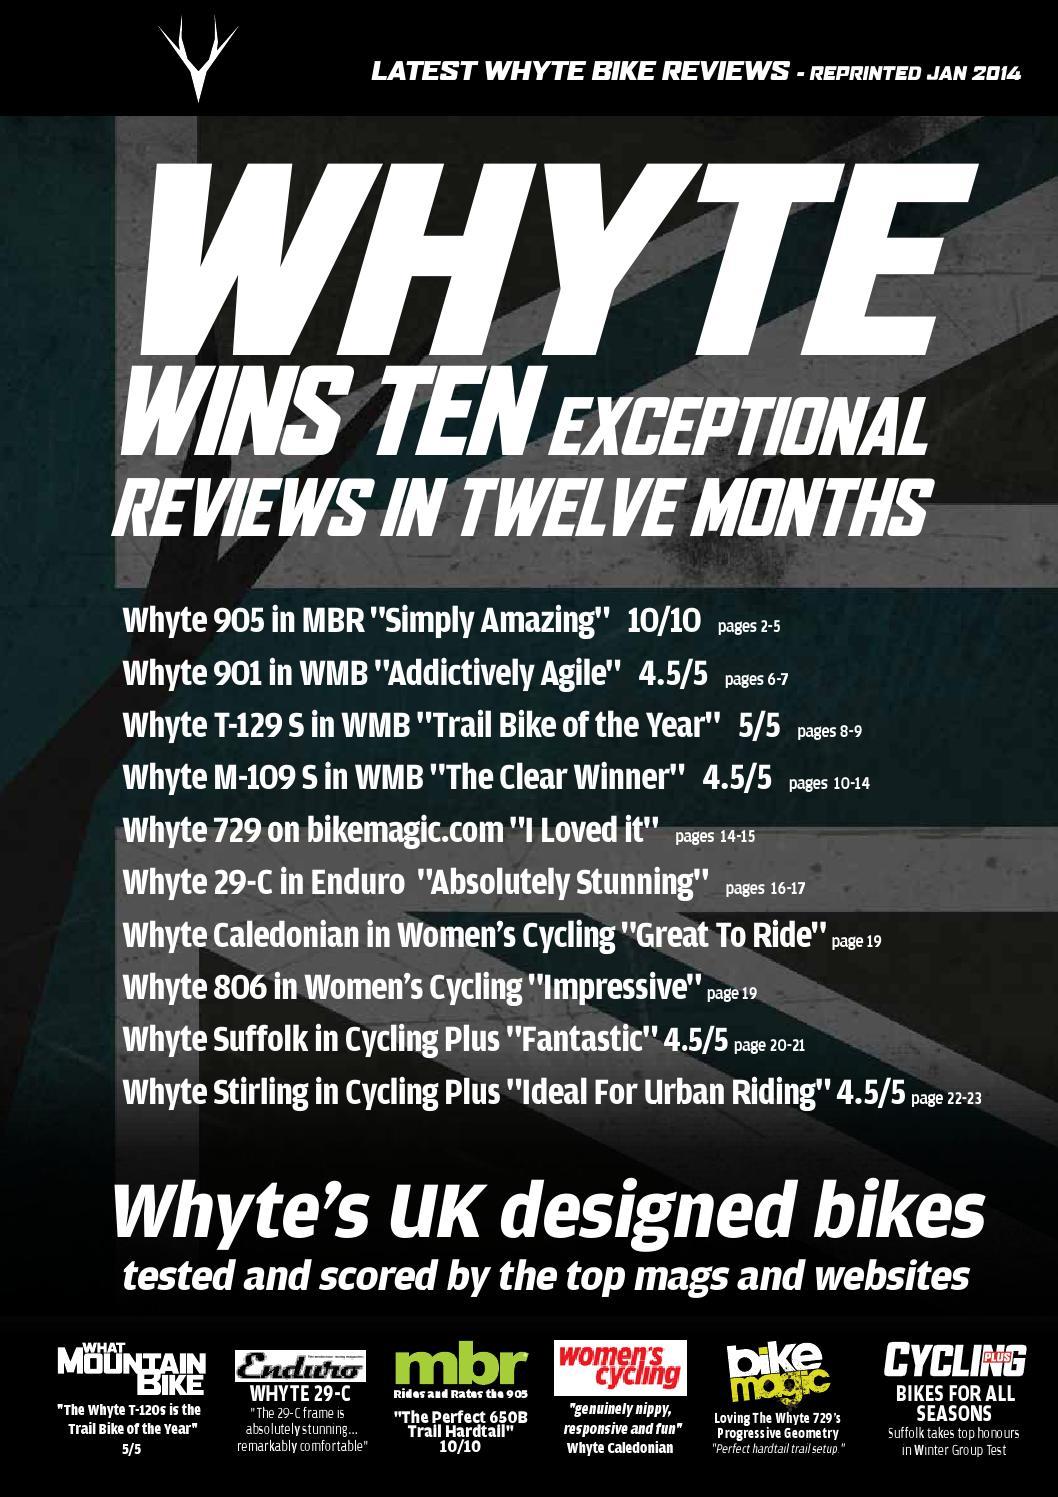 d162ff34b8b Whyte Top Ten Reviews - December 2013 by ATB Sales Ltd - issuu